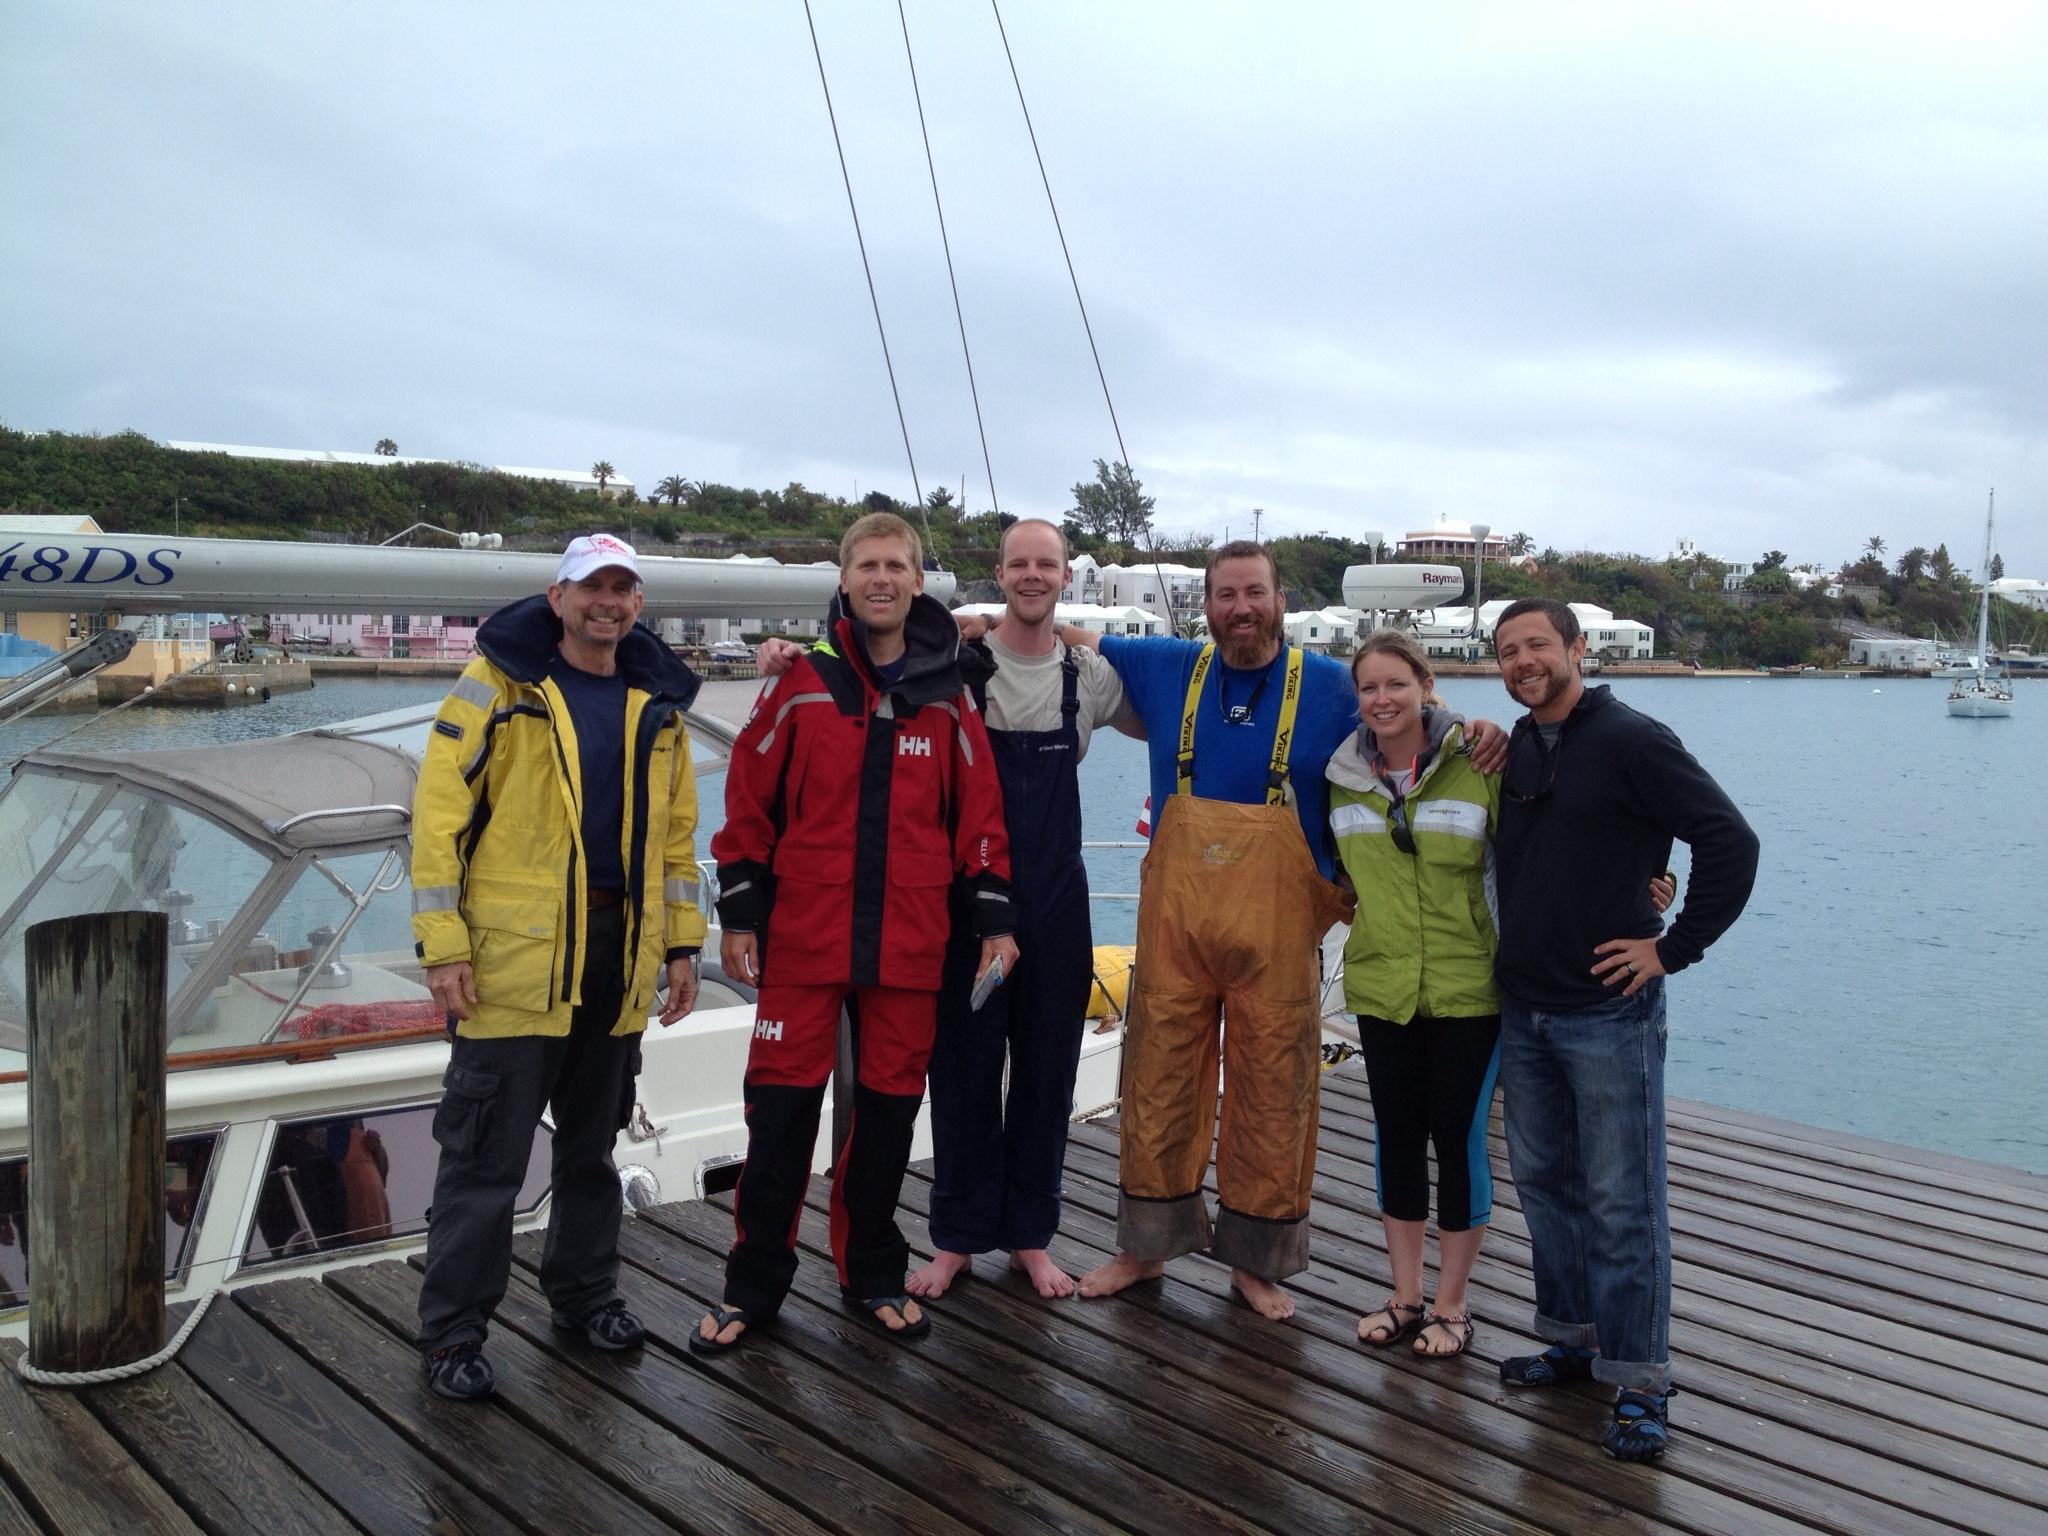 Crew change in Bermuda, from left: David, Andy, Austin, Billy, Lindsey & Casey. Photo by Carole Longendyke